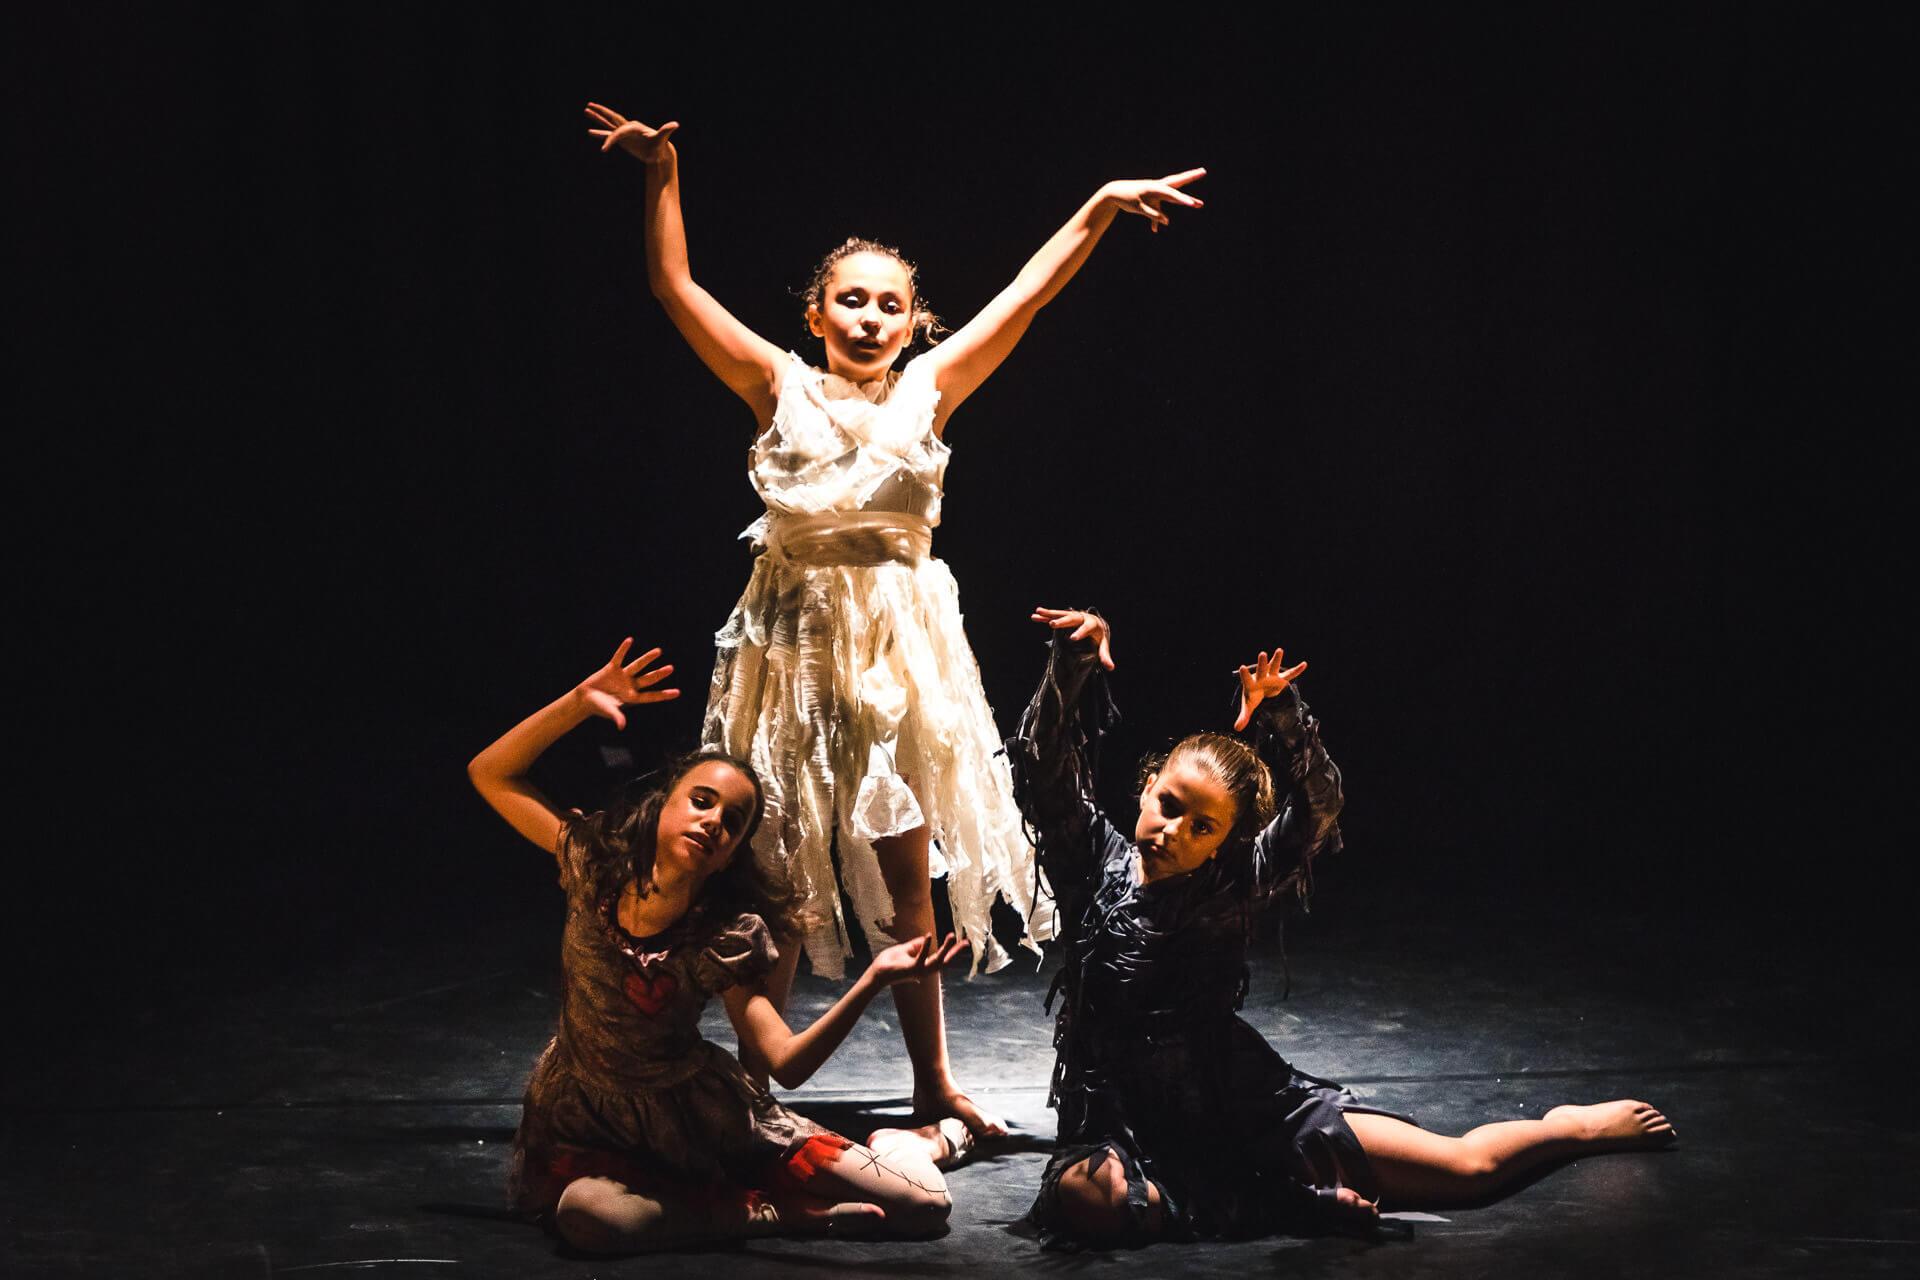 spectacle danse photographe studio graou herault